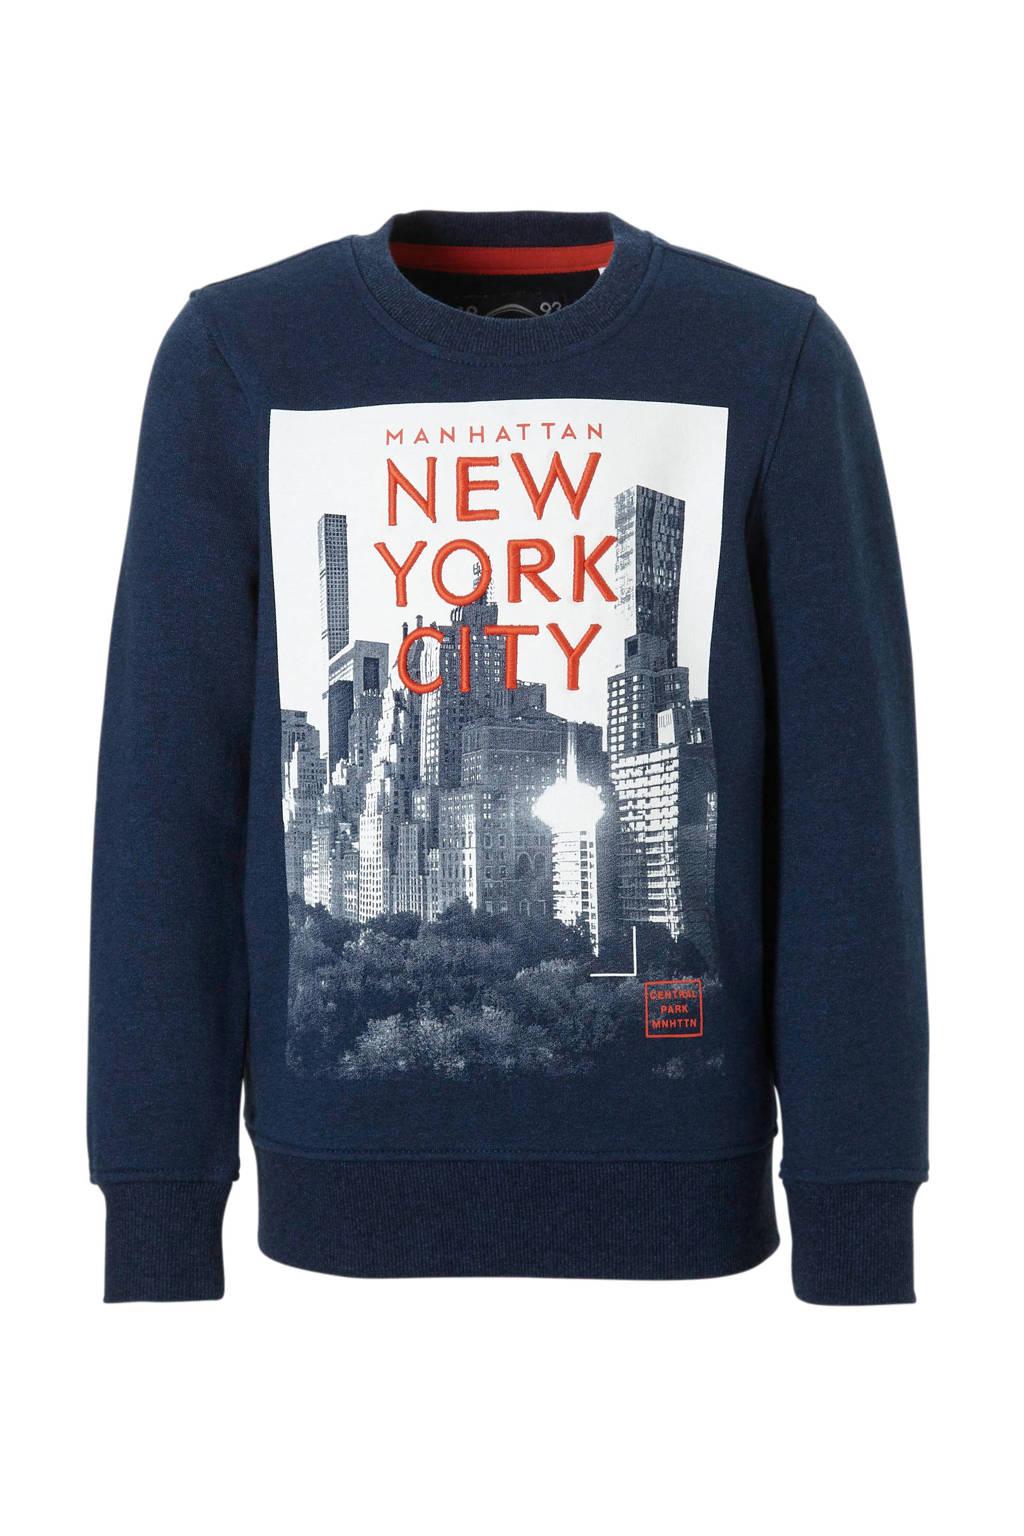 C&A Here & There sweater met New York printopdruk blauw, Donkerblauw